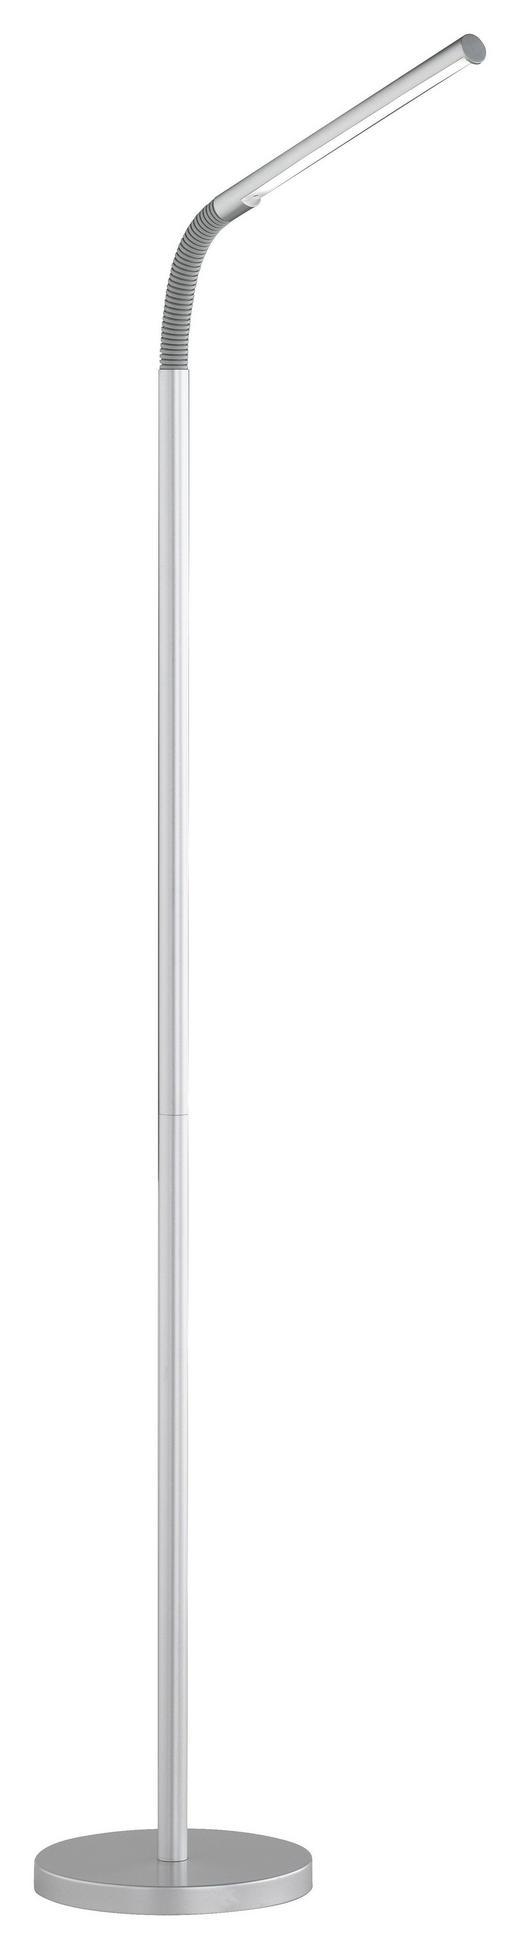 STEHLEUCHTE - Grau, LIFESTYLE, Metall (20/150cm)